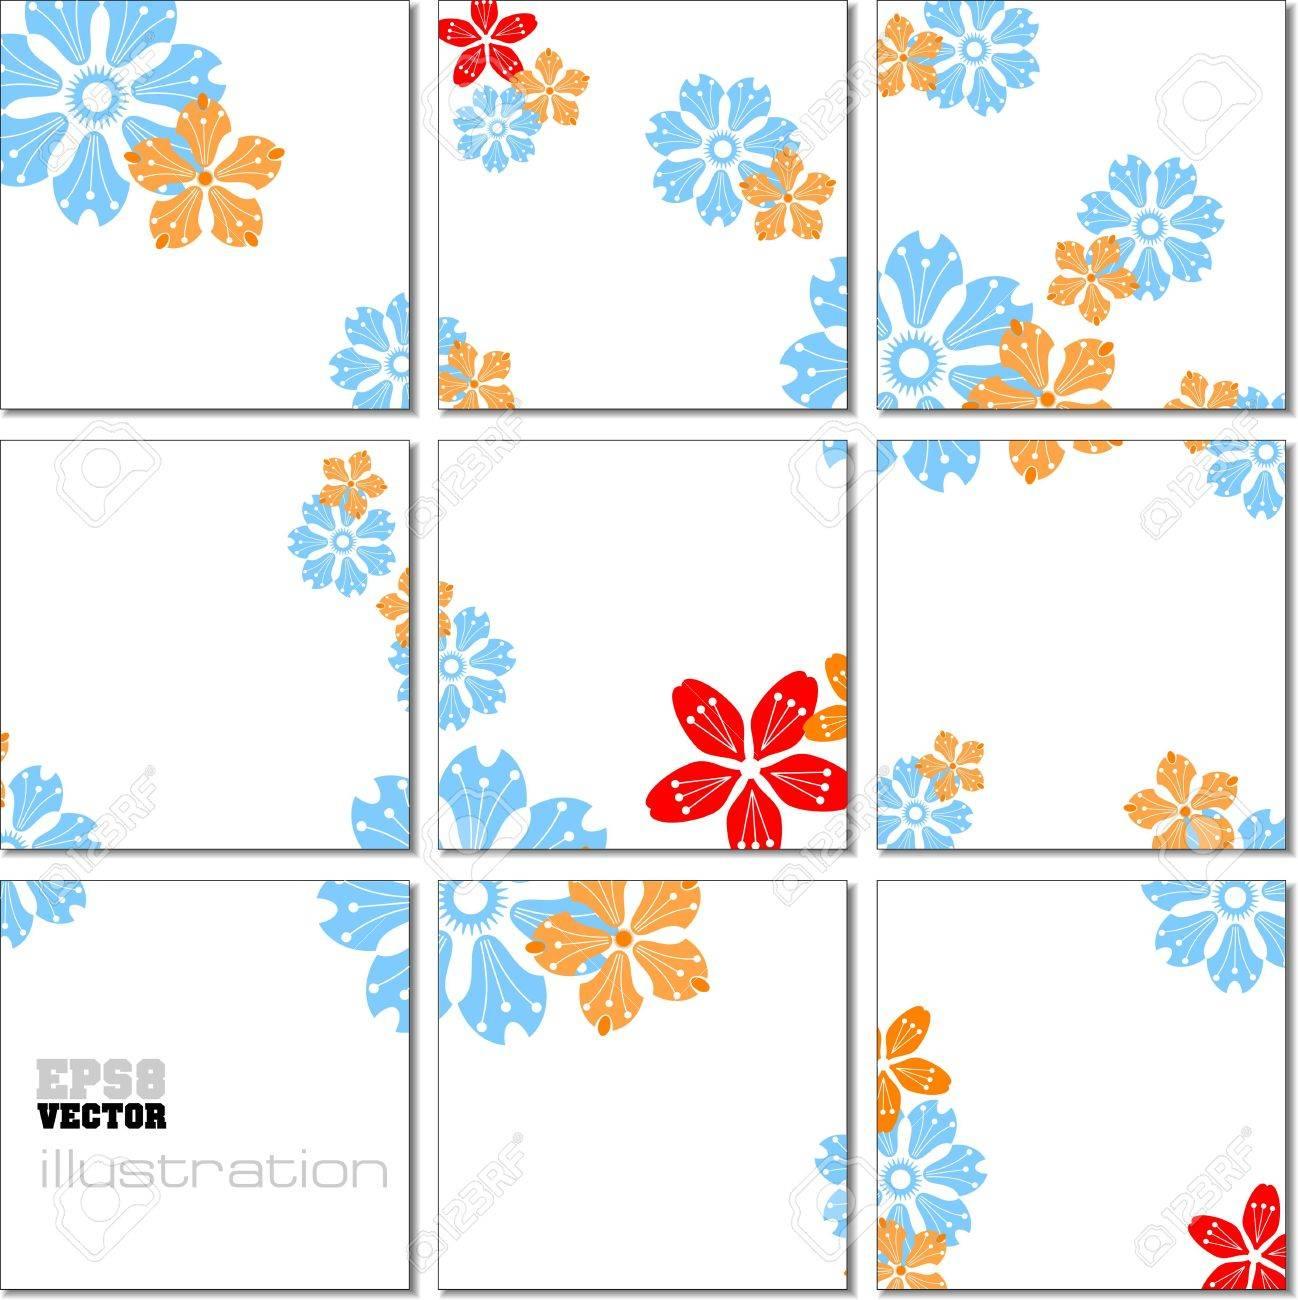 Illustration geometrical mosaic pattern in blue tones Stock Vector - 10556816